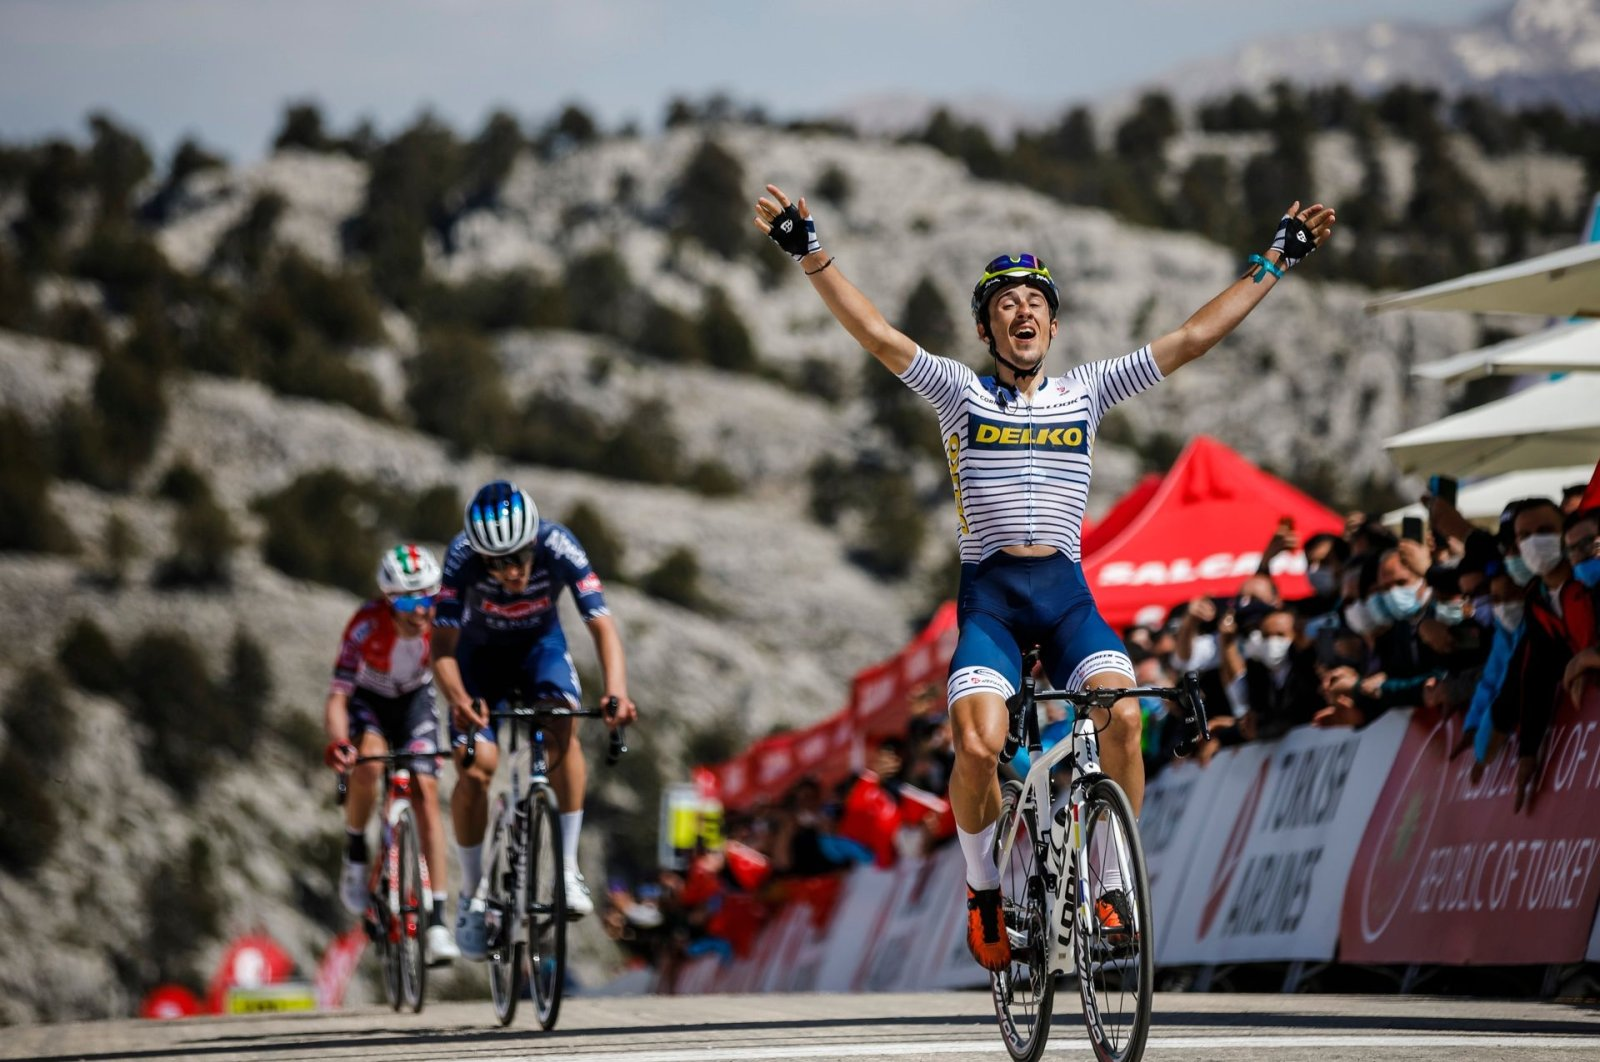 Spanish rider Jose Manuel Diaz celebrates winning the 160.3-kilometerfifth stage of the 56th Presidential Cycling Tour of Turkey, Elmalı, southern Turkey, April 15, 2021.